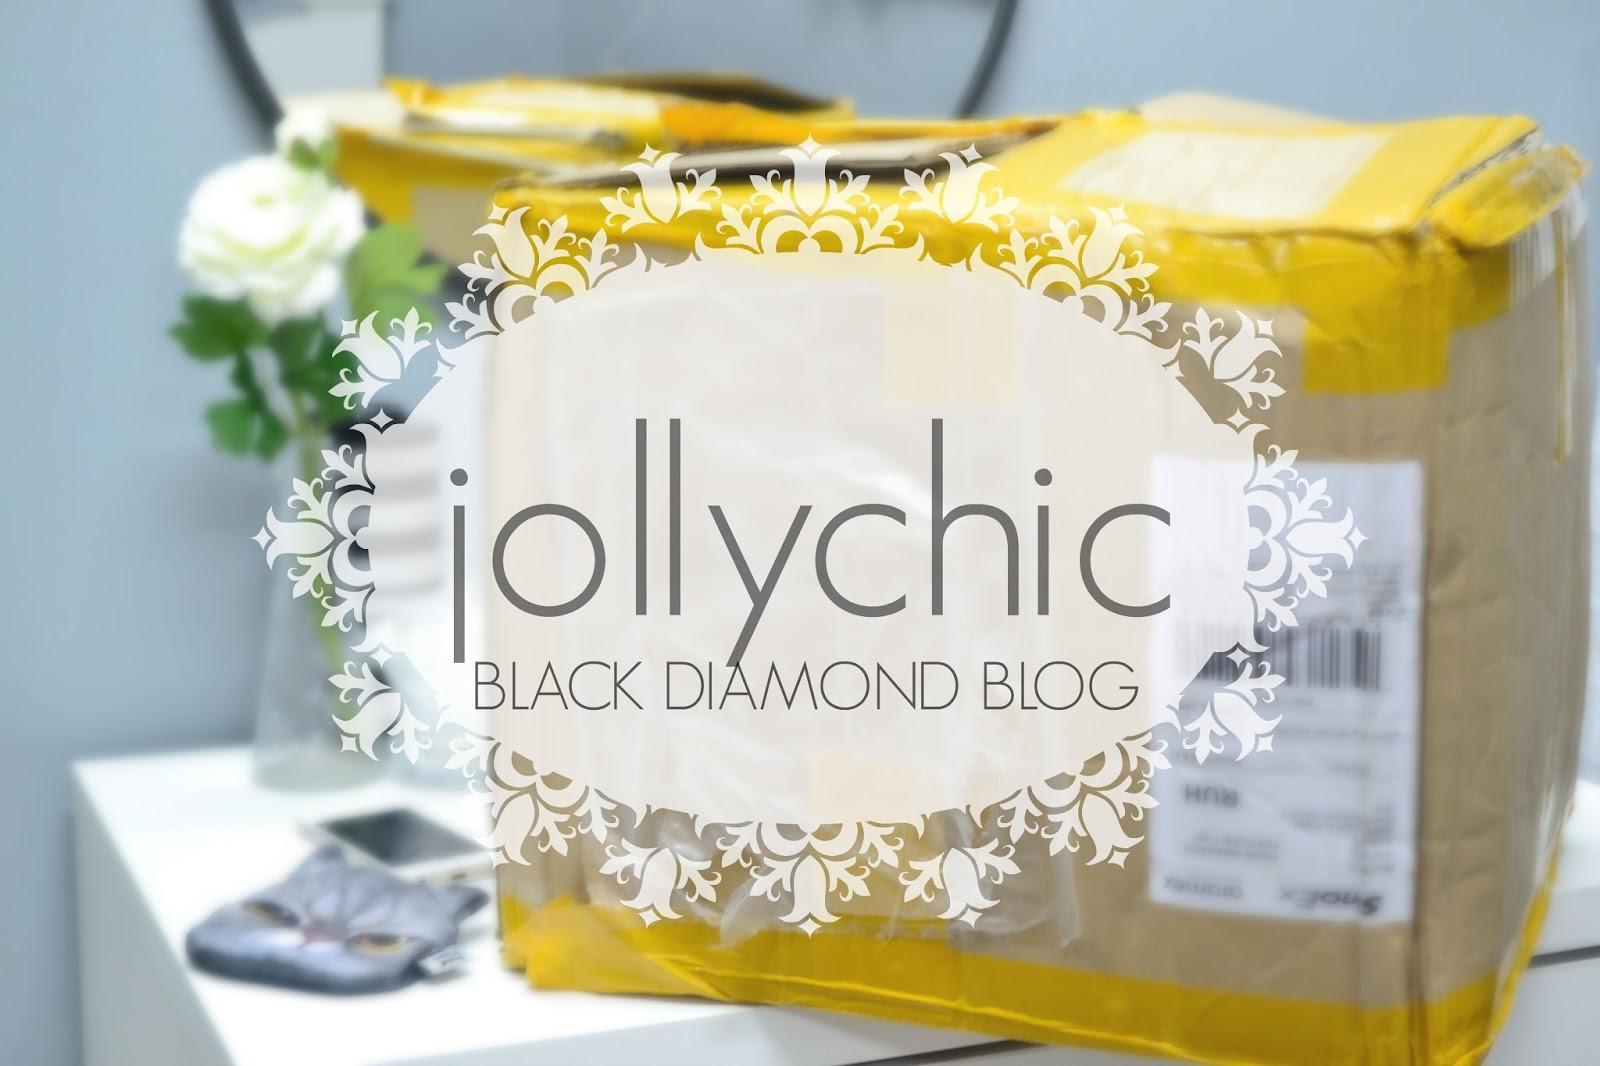 382243c3236c7 Black Diamond   تجربتي من موقع جولي شيك jollychic ! محدث